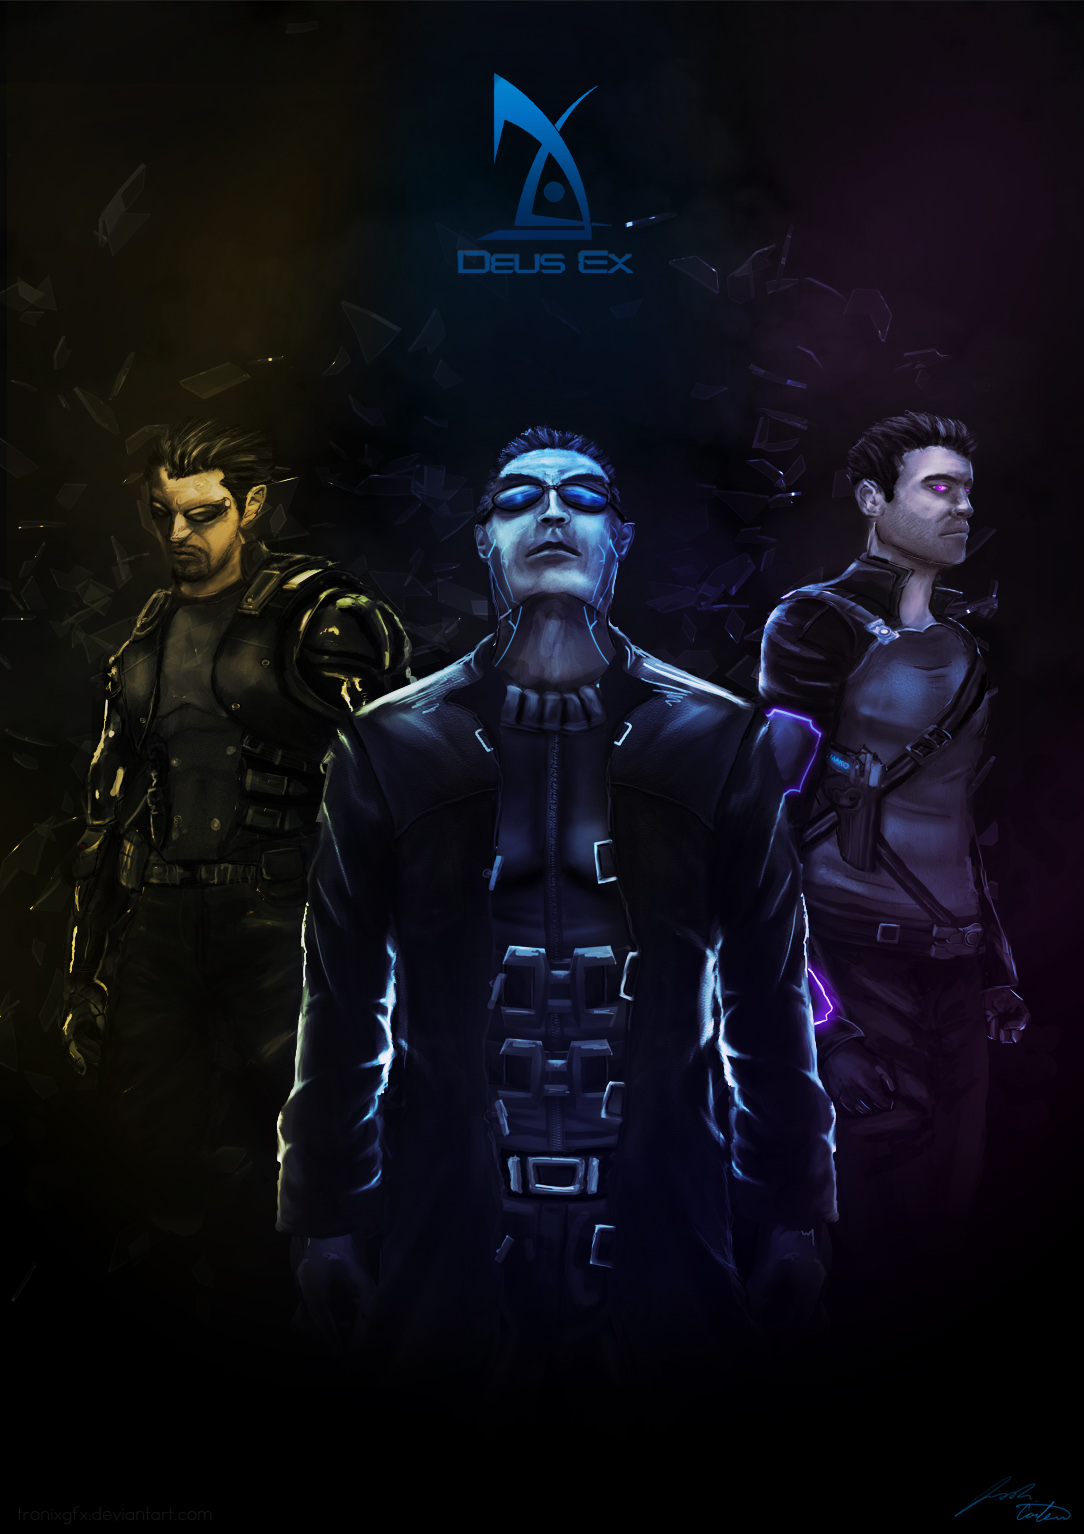 deus_ex__protagonists_by_tronixgfx-d40k0r0.jpg